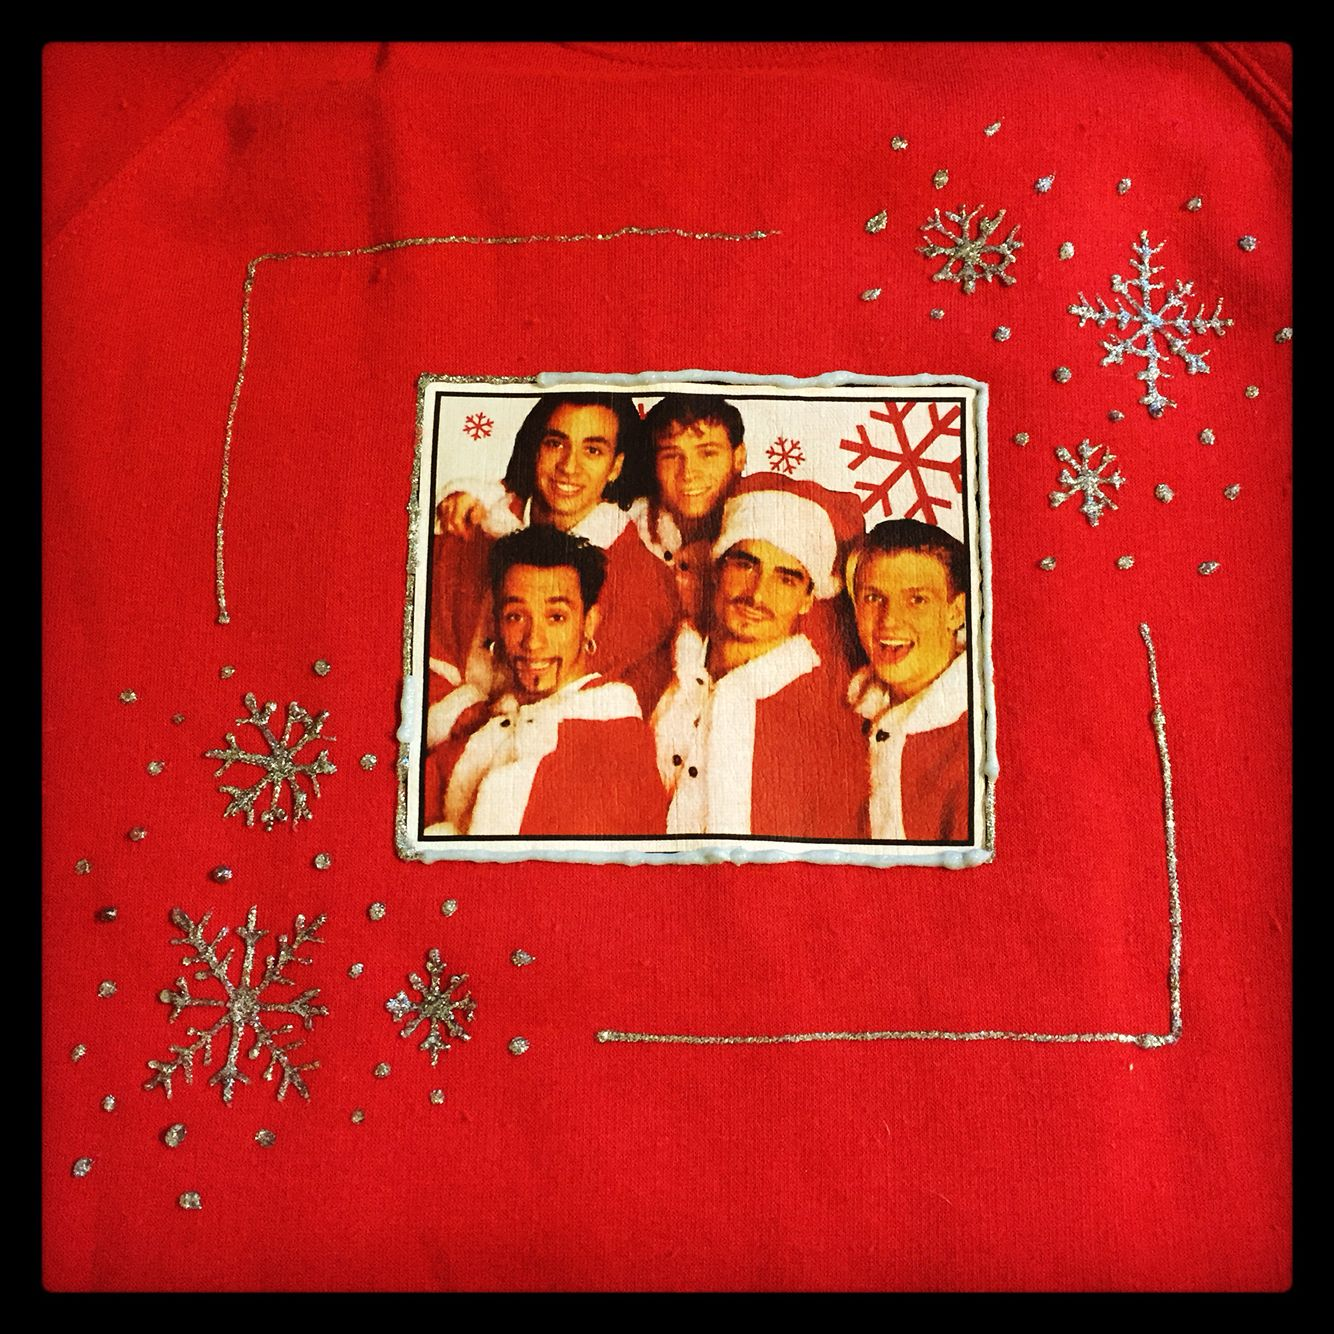 Backstreet Boys Christmas Sweater.Handmade Backstreet Boys Christmas Sweater Backstreetboys